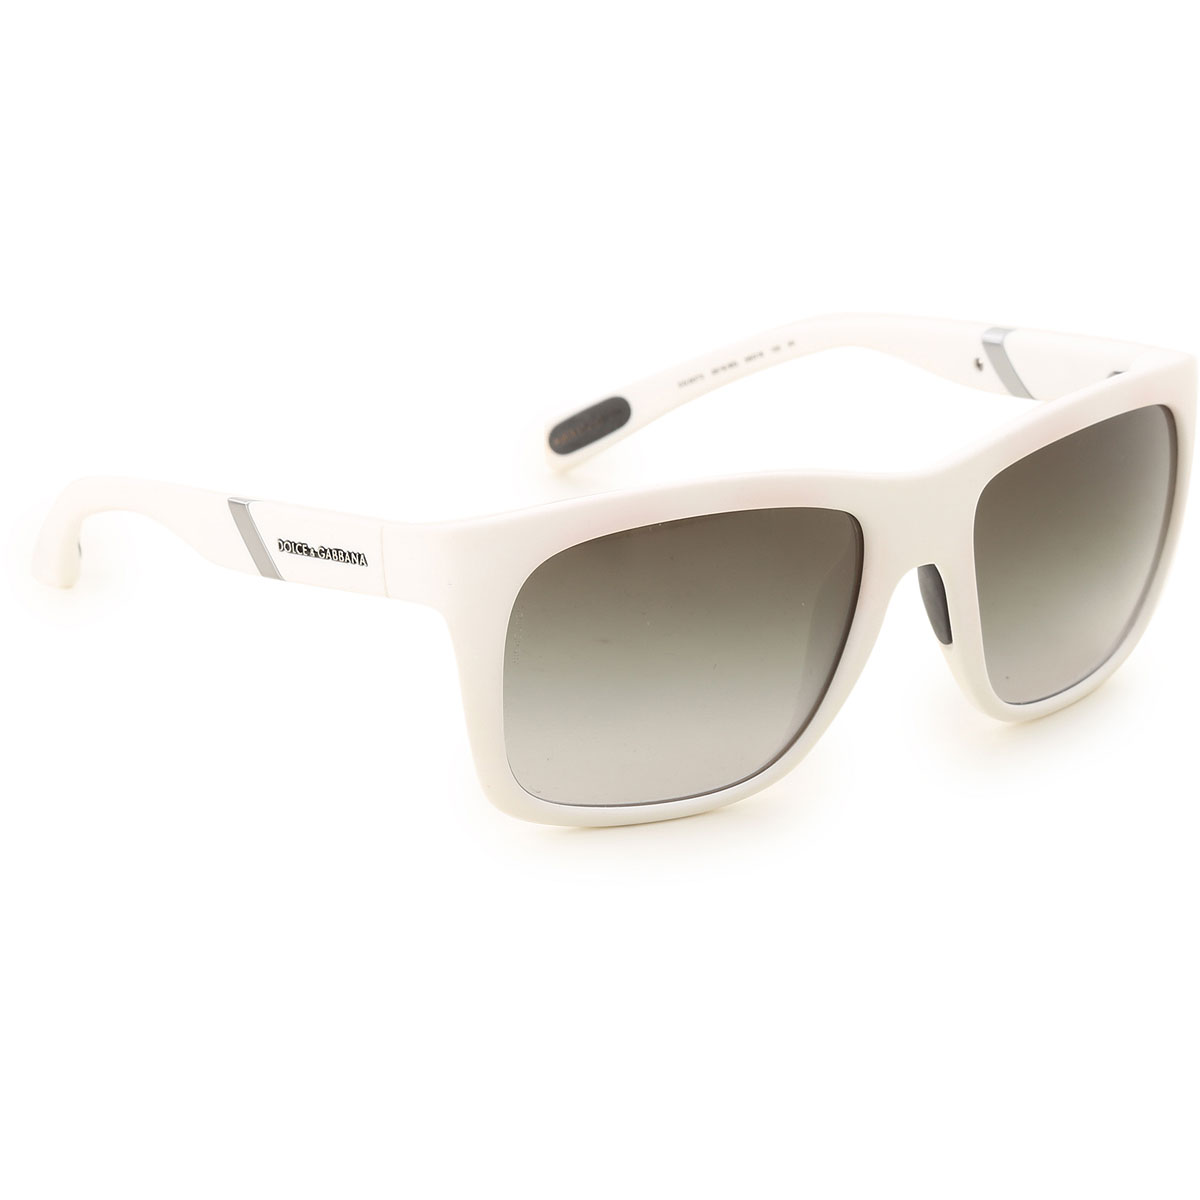 Image of Dolce & Gabbana Sunglasses On Sale, Matt White, 2017